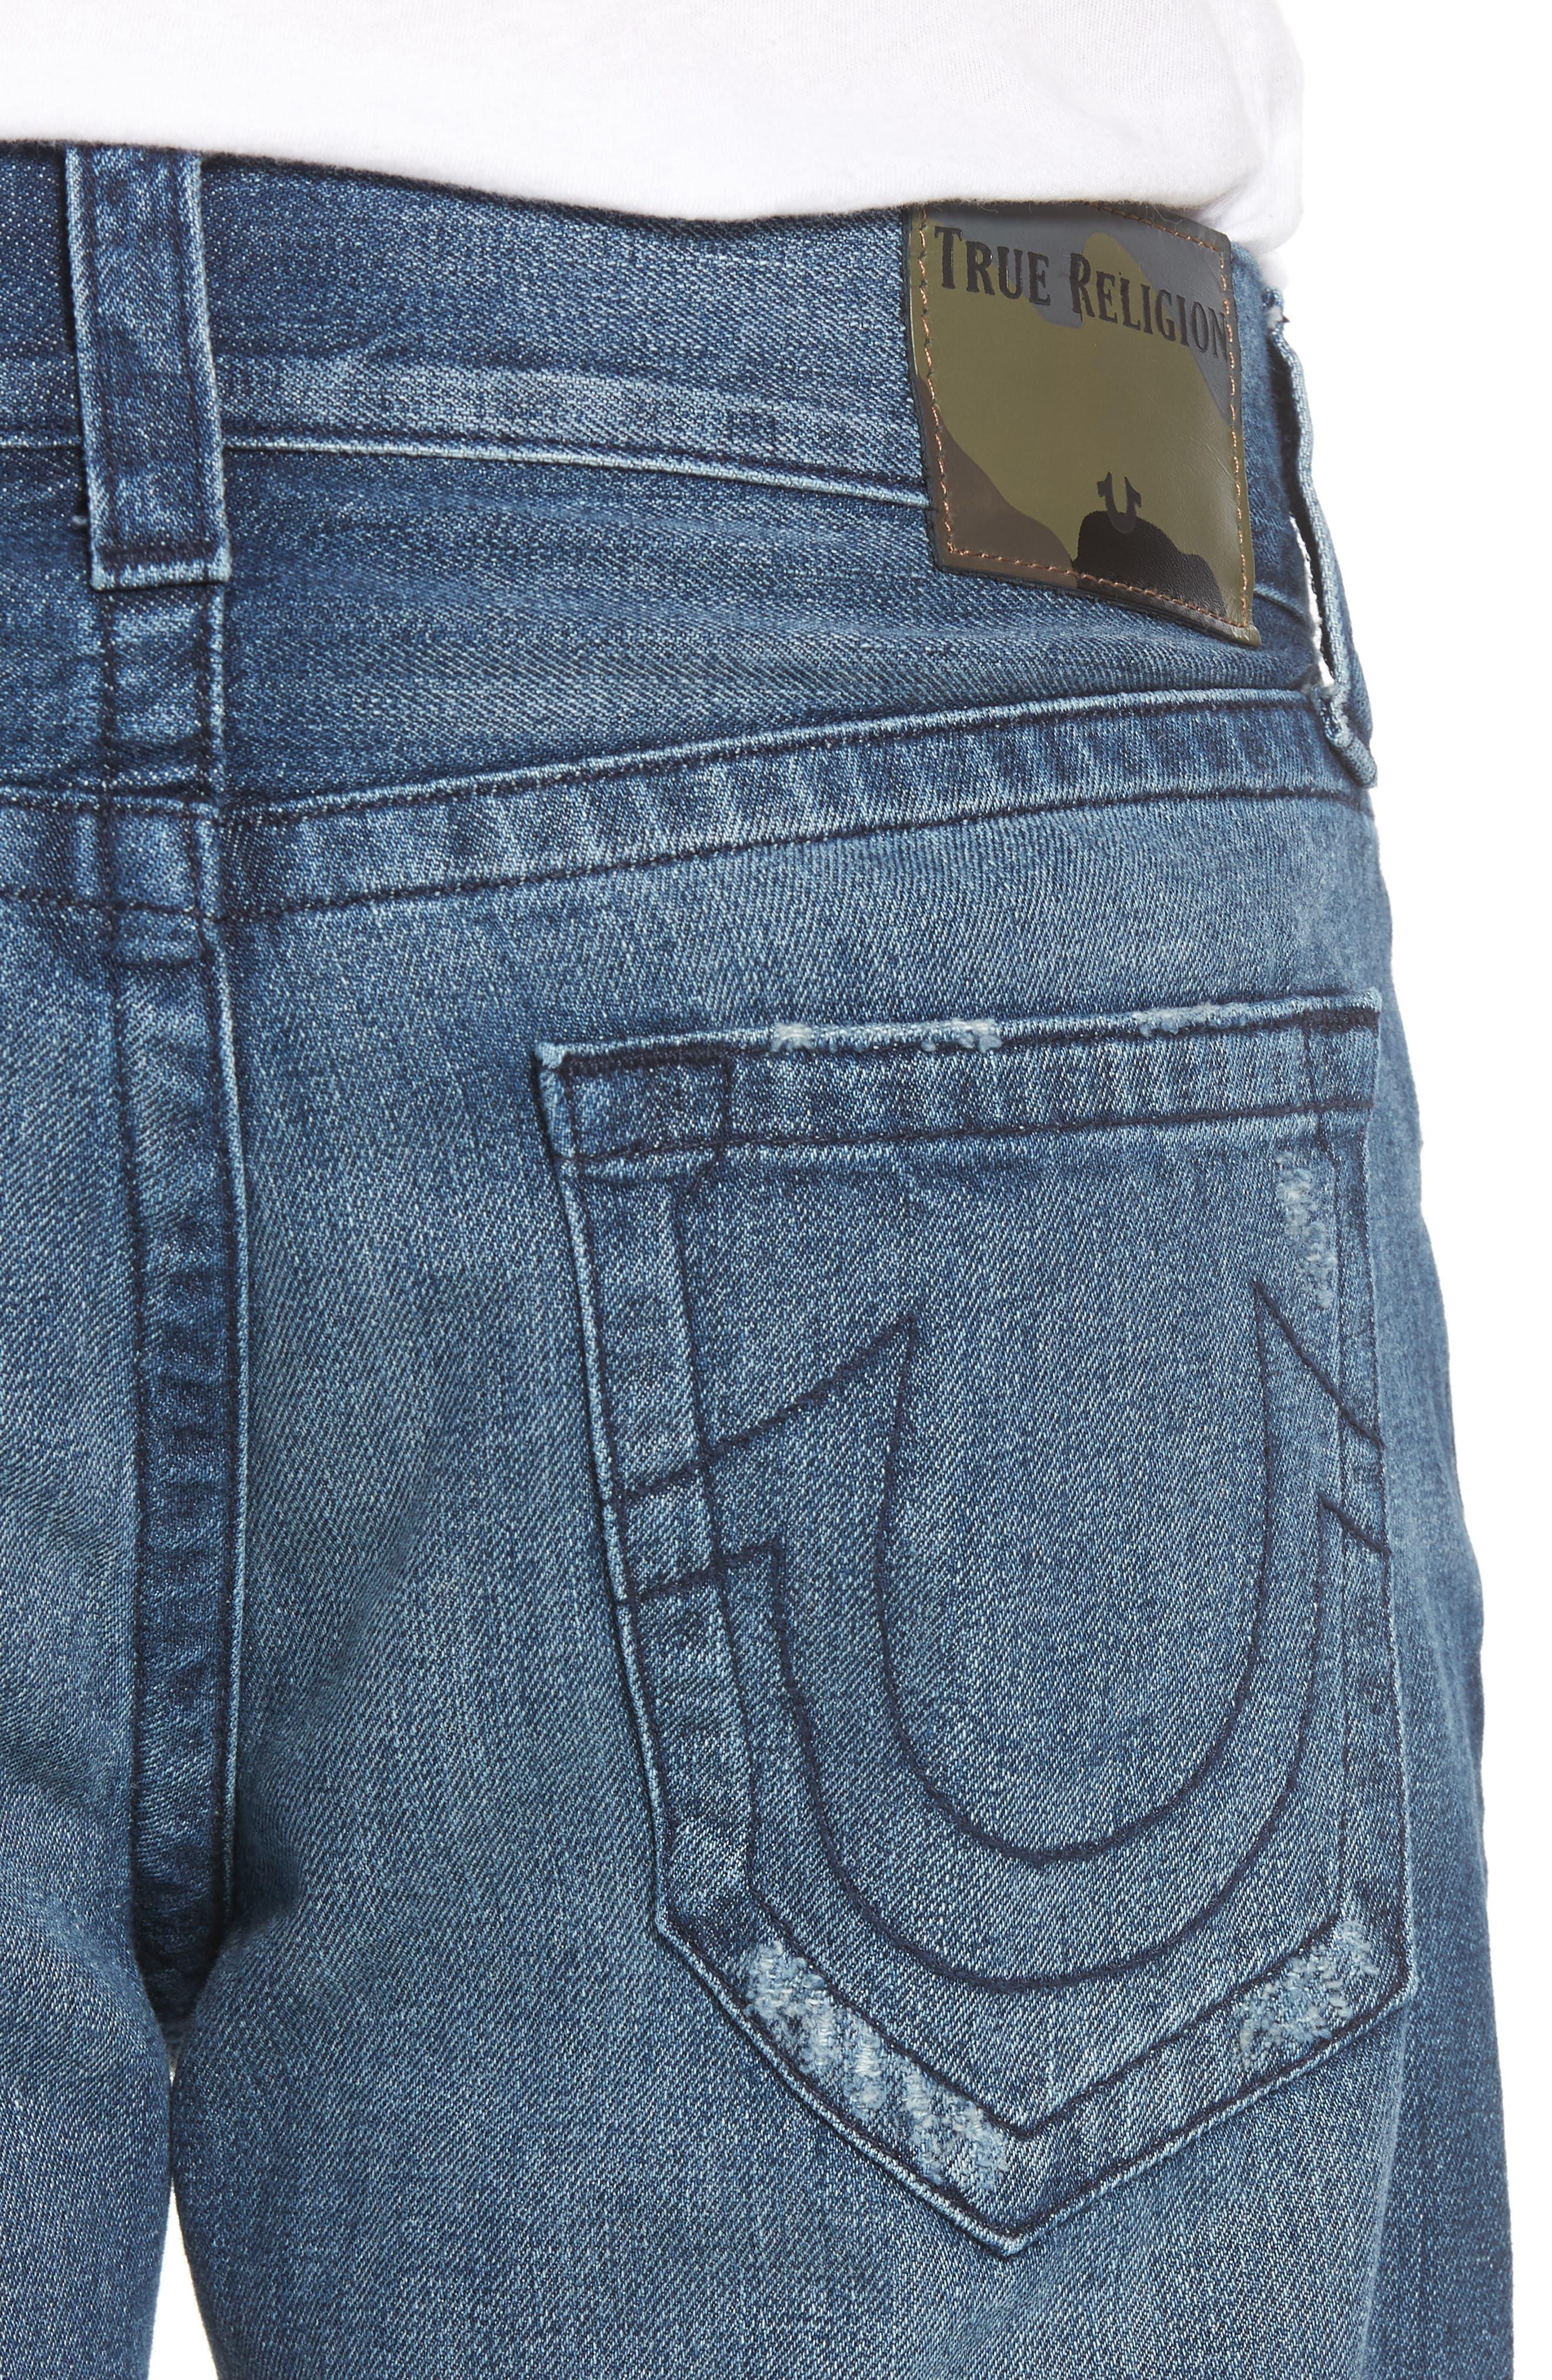 Geno Straight Leg Jeans,                             Alternate thumbnail 4, color,                             Worn Suspect